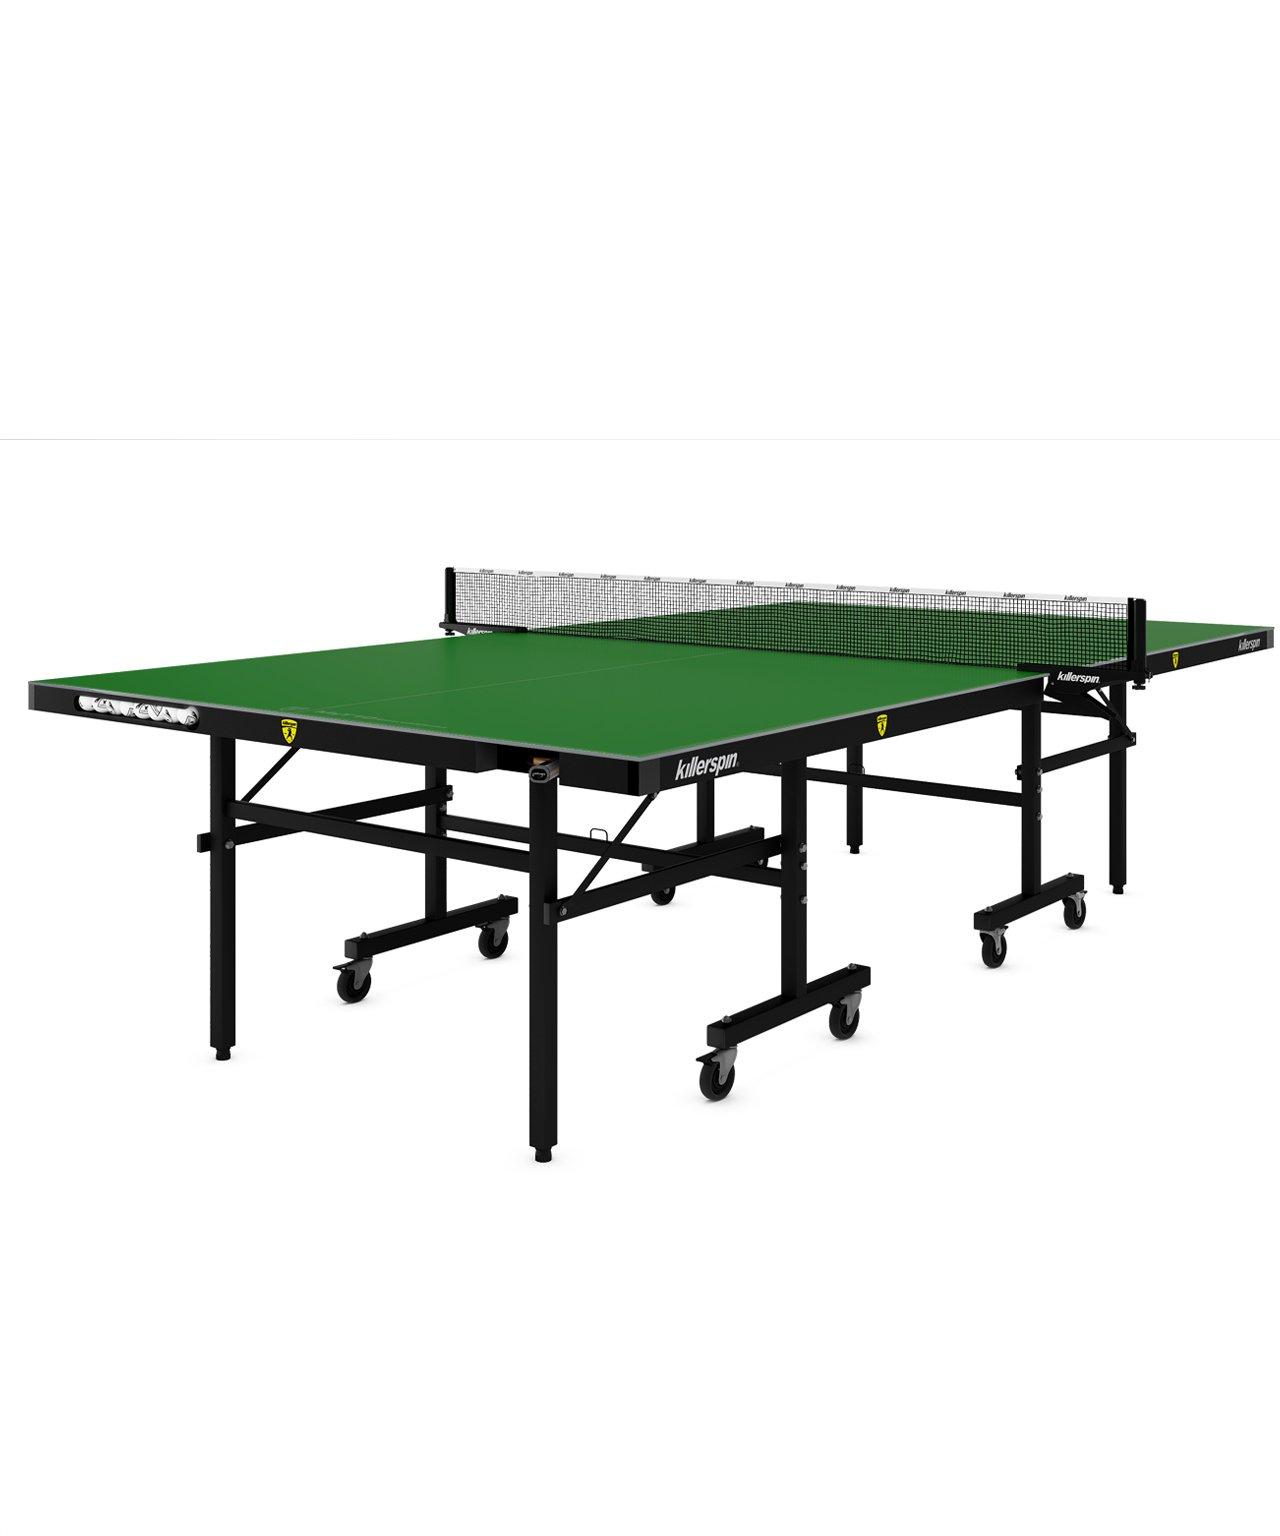 killerspin-ping-pong-table-myt10-emeraldcost-green-01